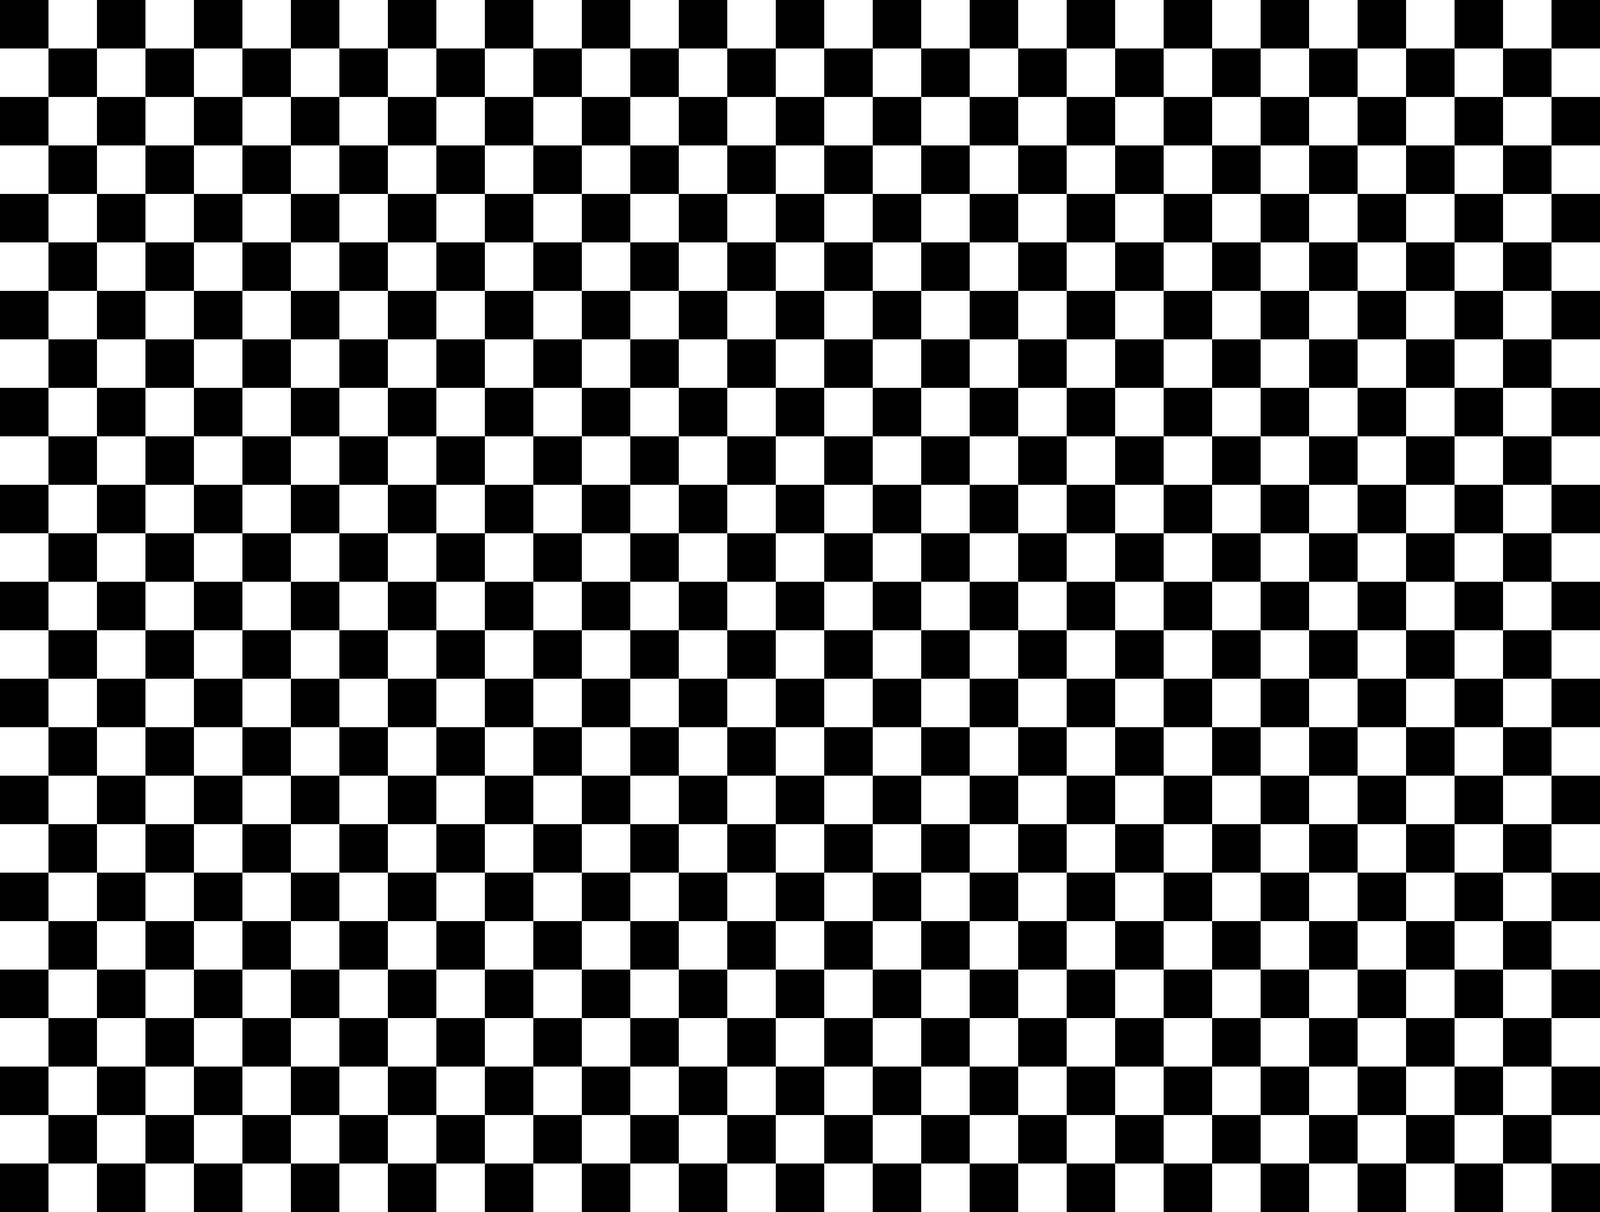 1600x1212px Racing Checkered Flag Wallpaper Borders 1600x1212